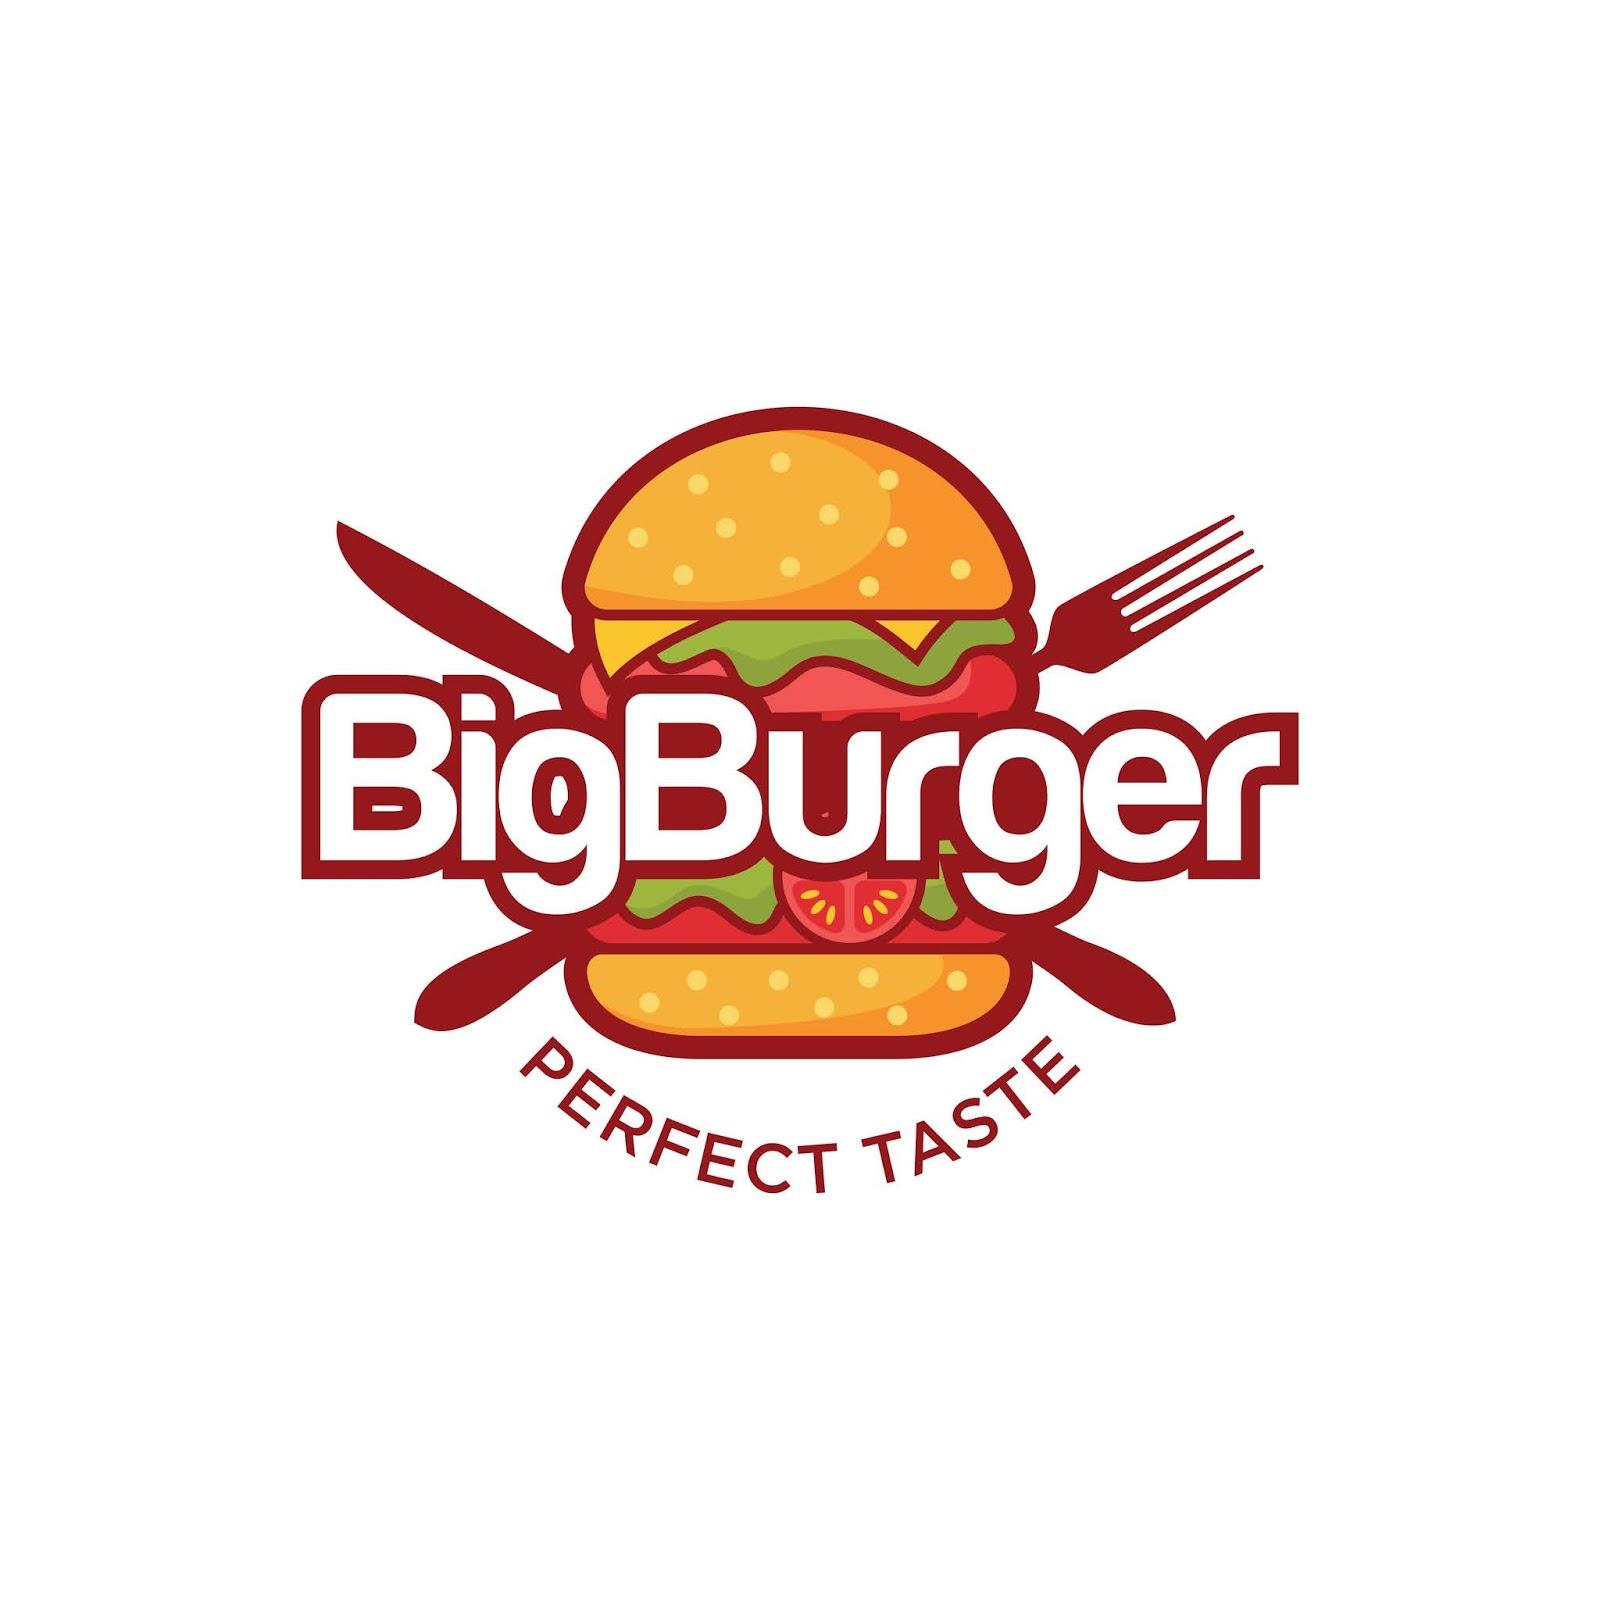 Burger Logo Free Download Vector CDR, AI, EPS and PNG Formats